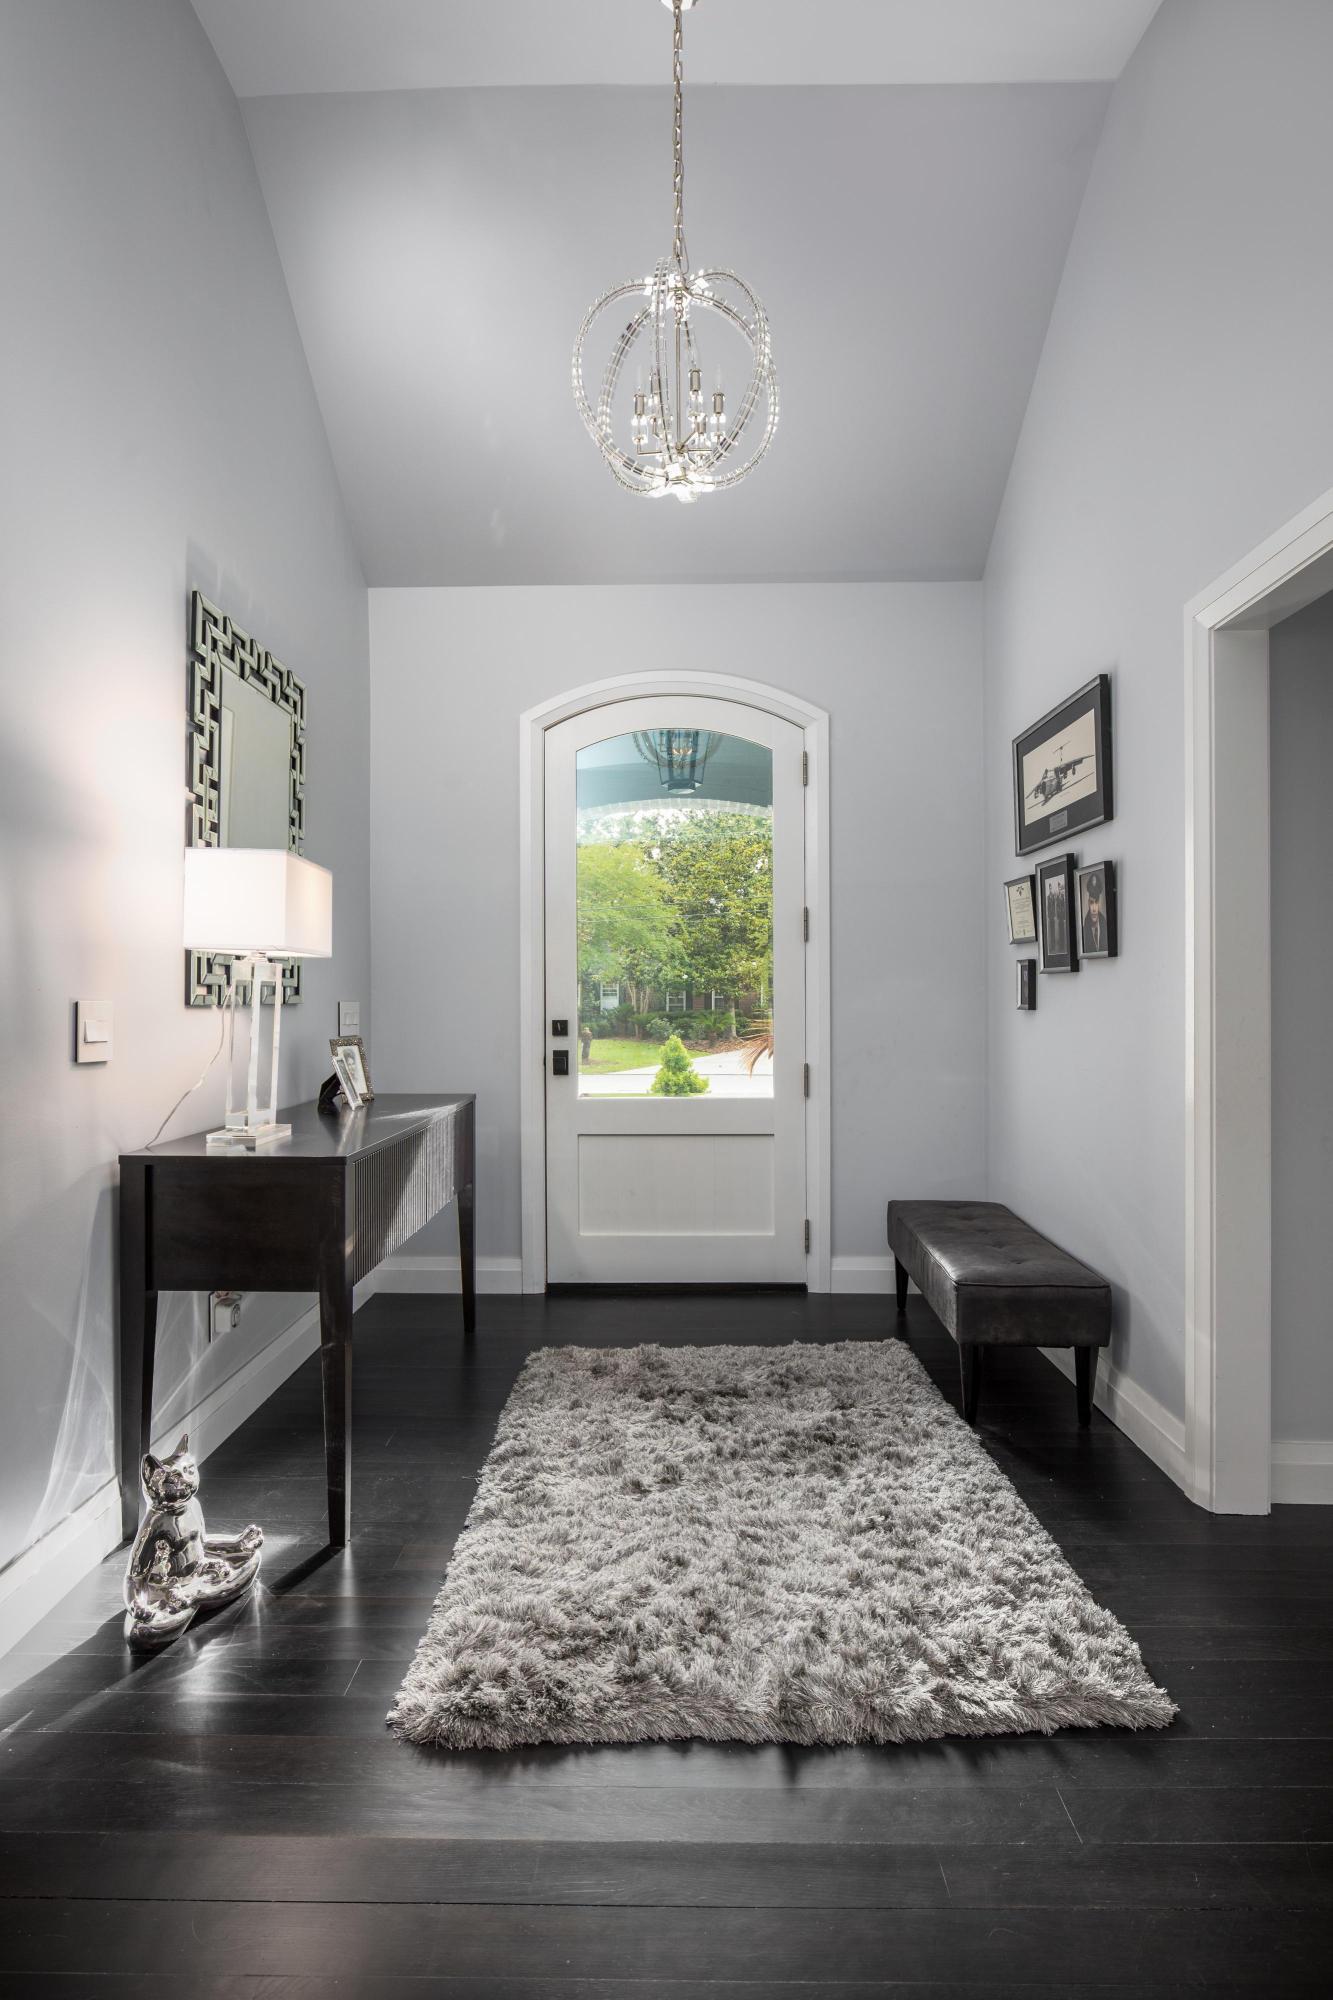 Country Club II Homes For Sale - 434 Greenbriar, Charleston, SC - 12